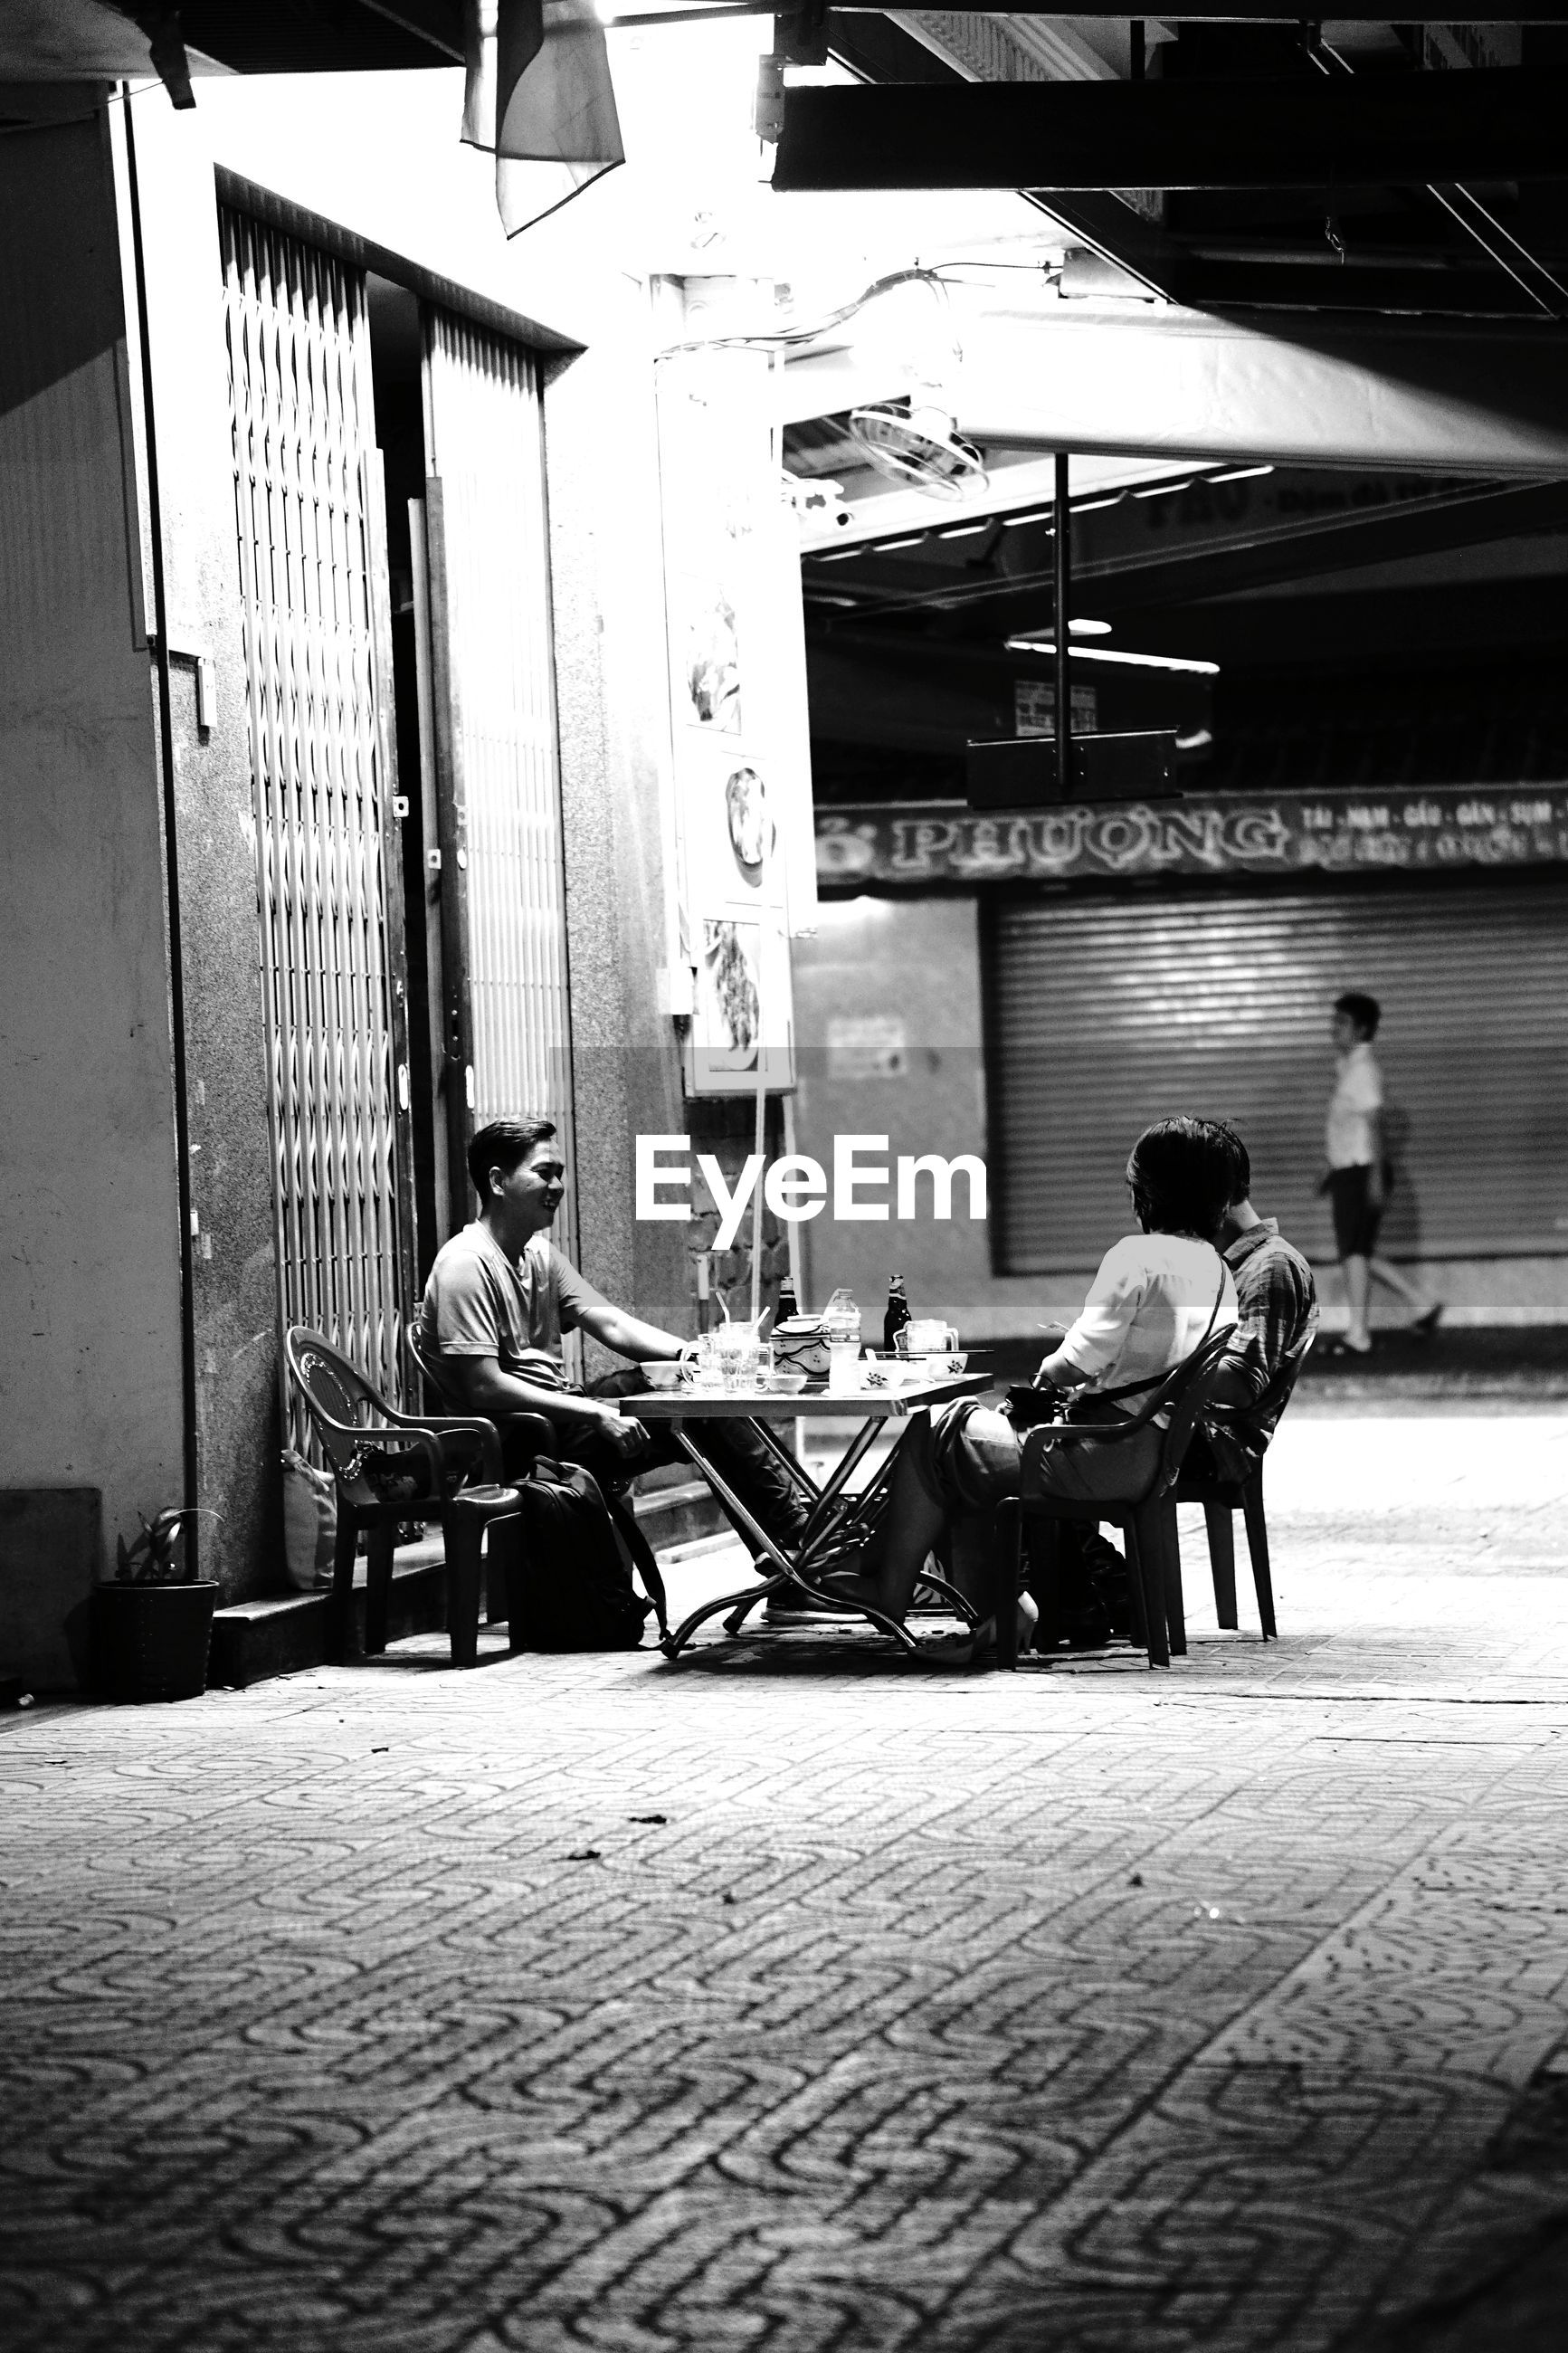 MEN SITTING ON FOOTPATH IN CITY